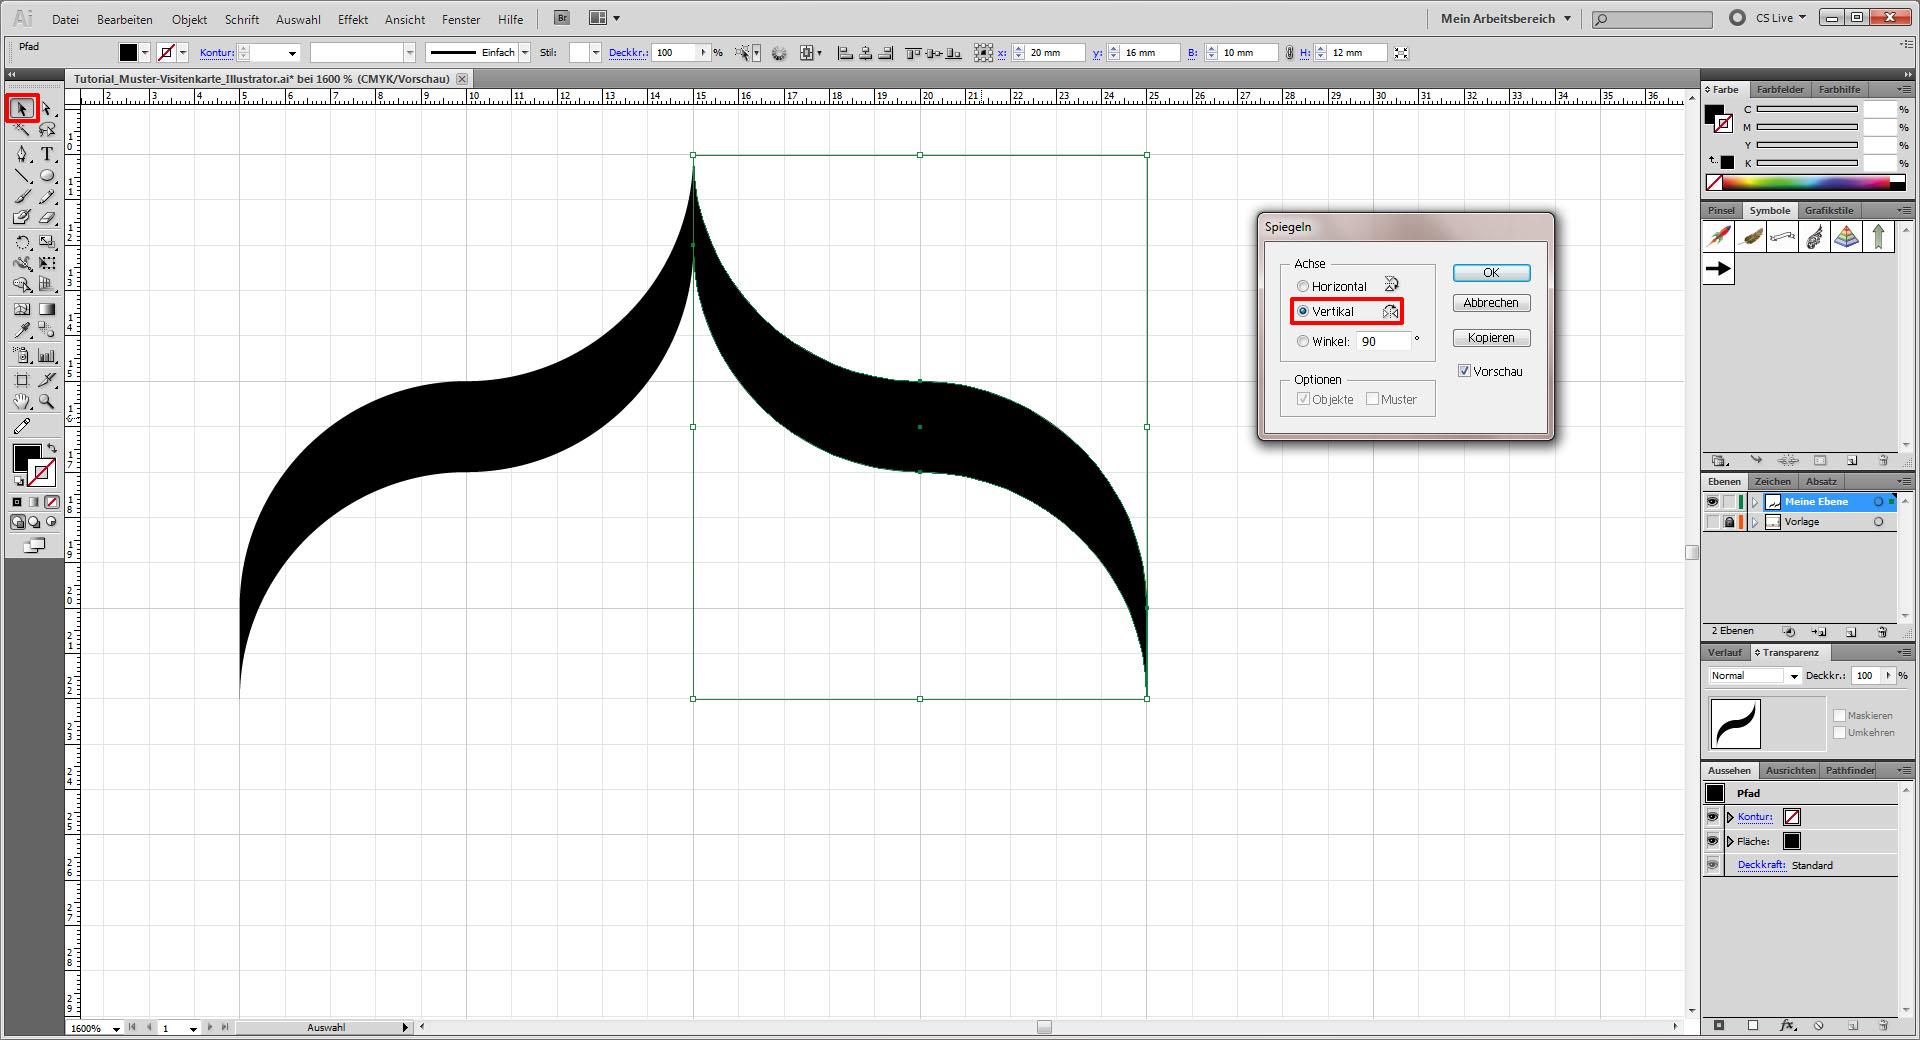 Tutorial Muster Visitenkarte in Illustrator erstellen Saxoprint